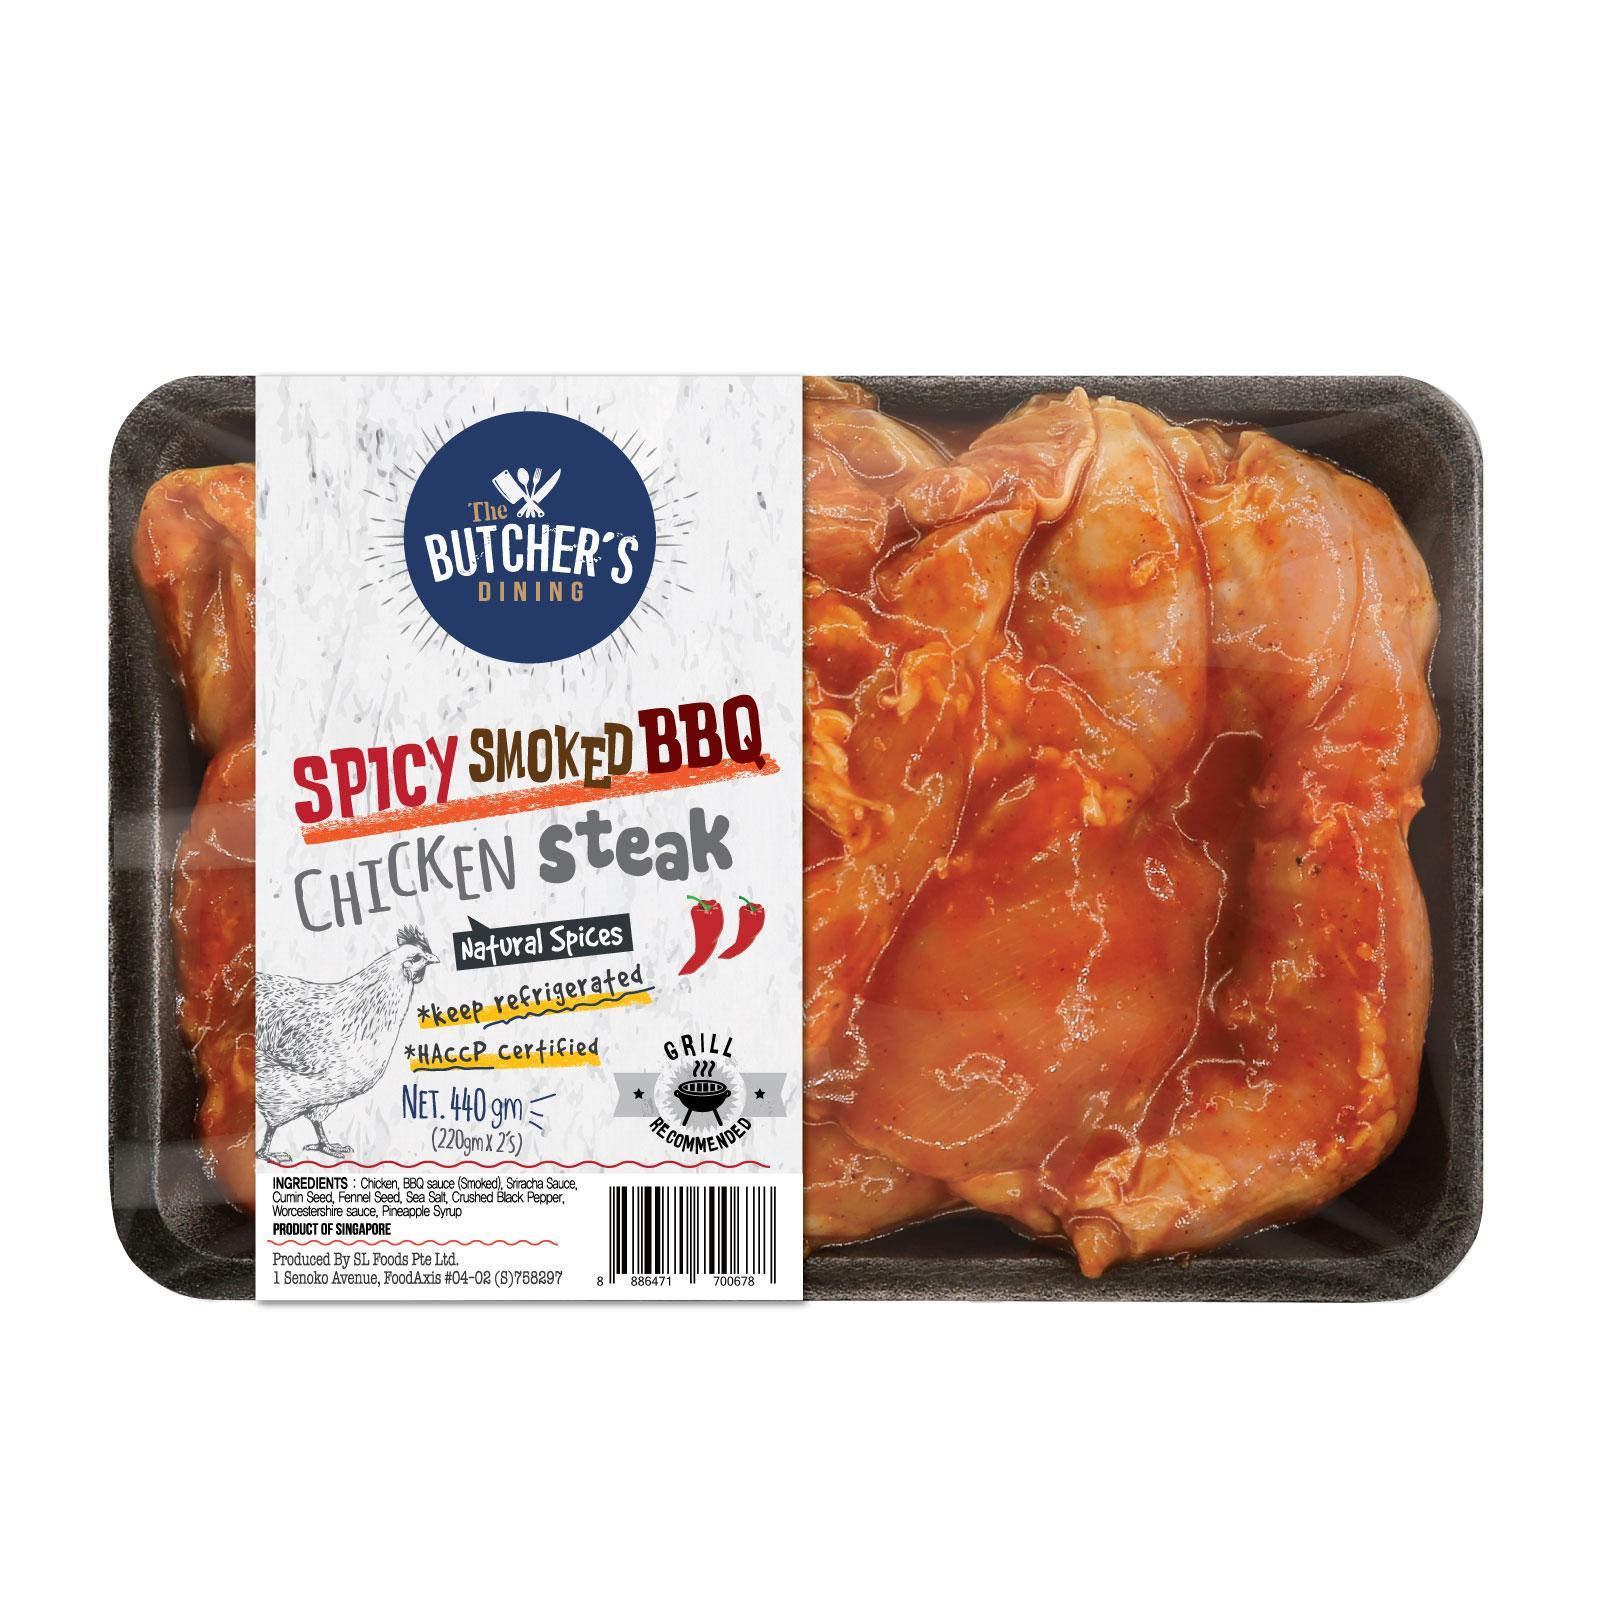 The Butcher's Dining Smoked Spicy BBQ Chicken Steak Chop